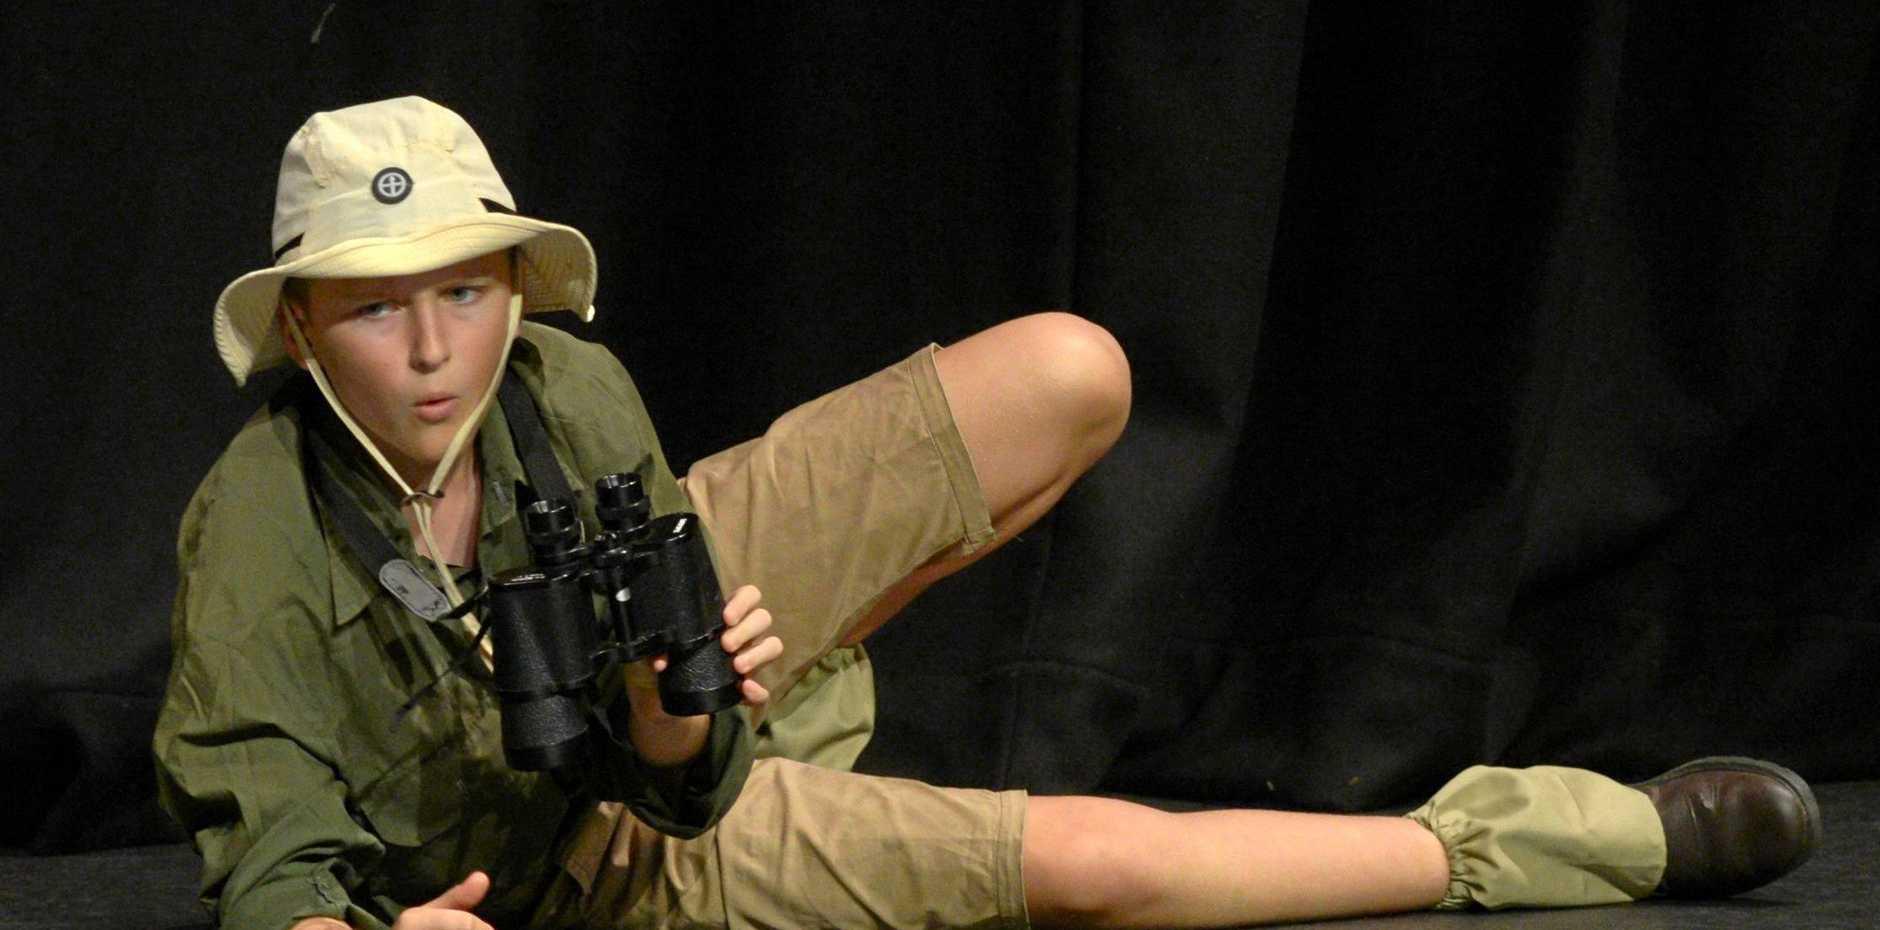 Lewis Christiansen in Section 369 - Character Recital in Costume Girls/Boys 10&U12 yrs (Rebecca Geldard trophy)